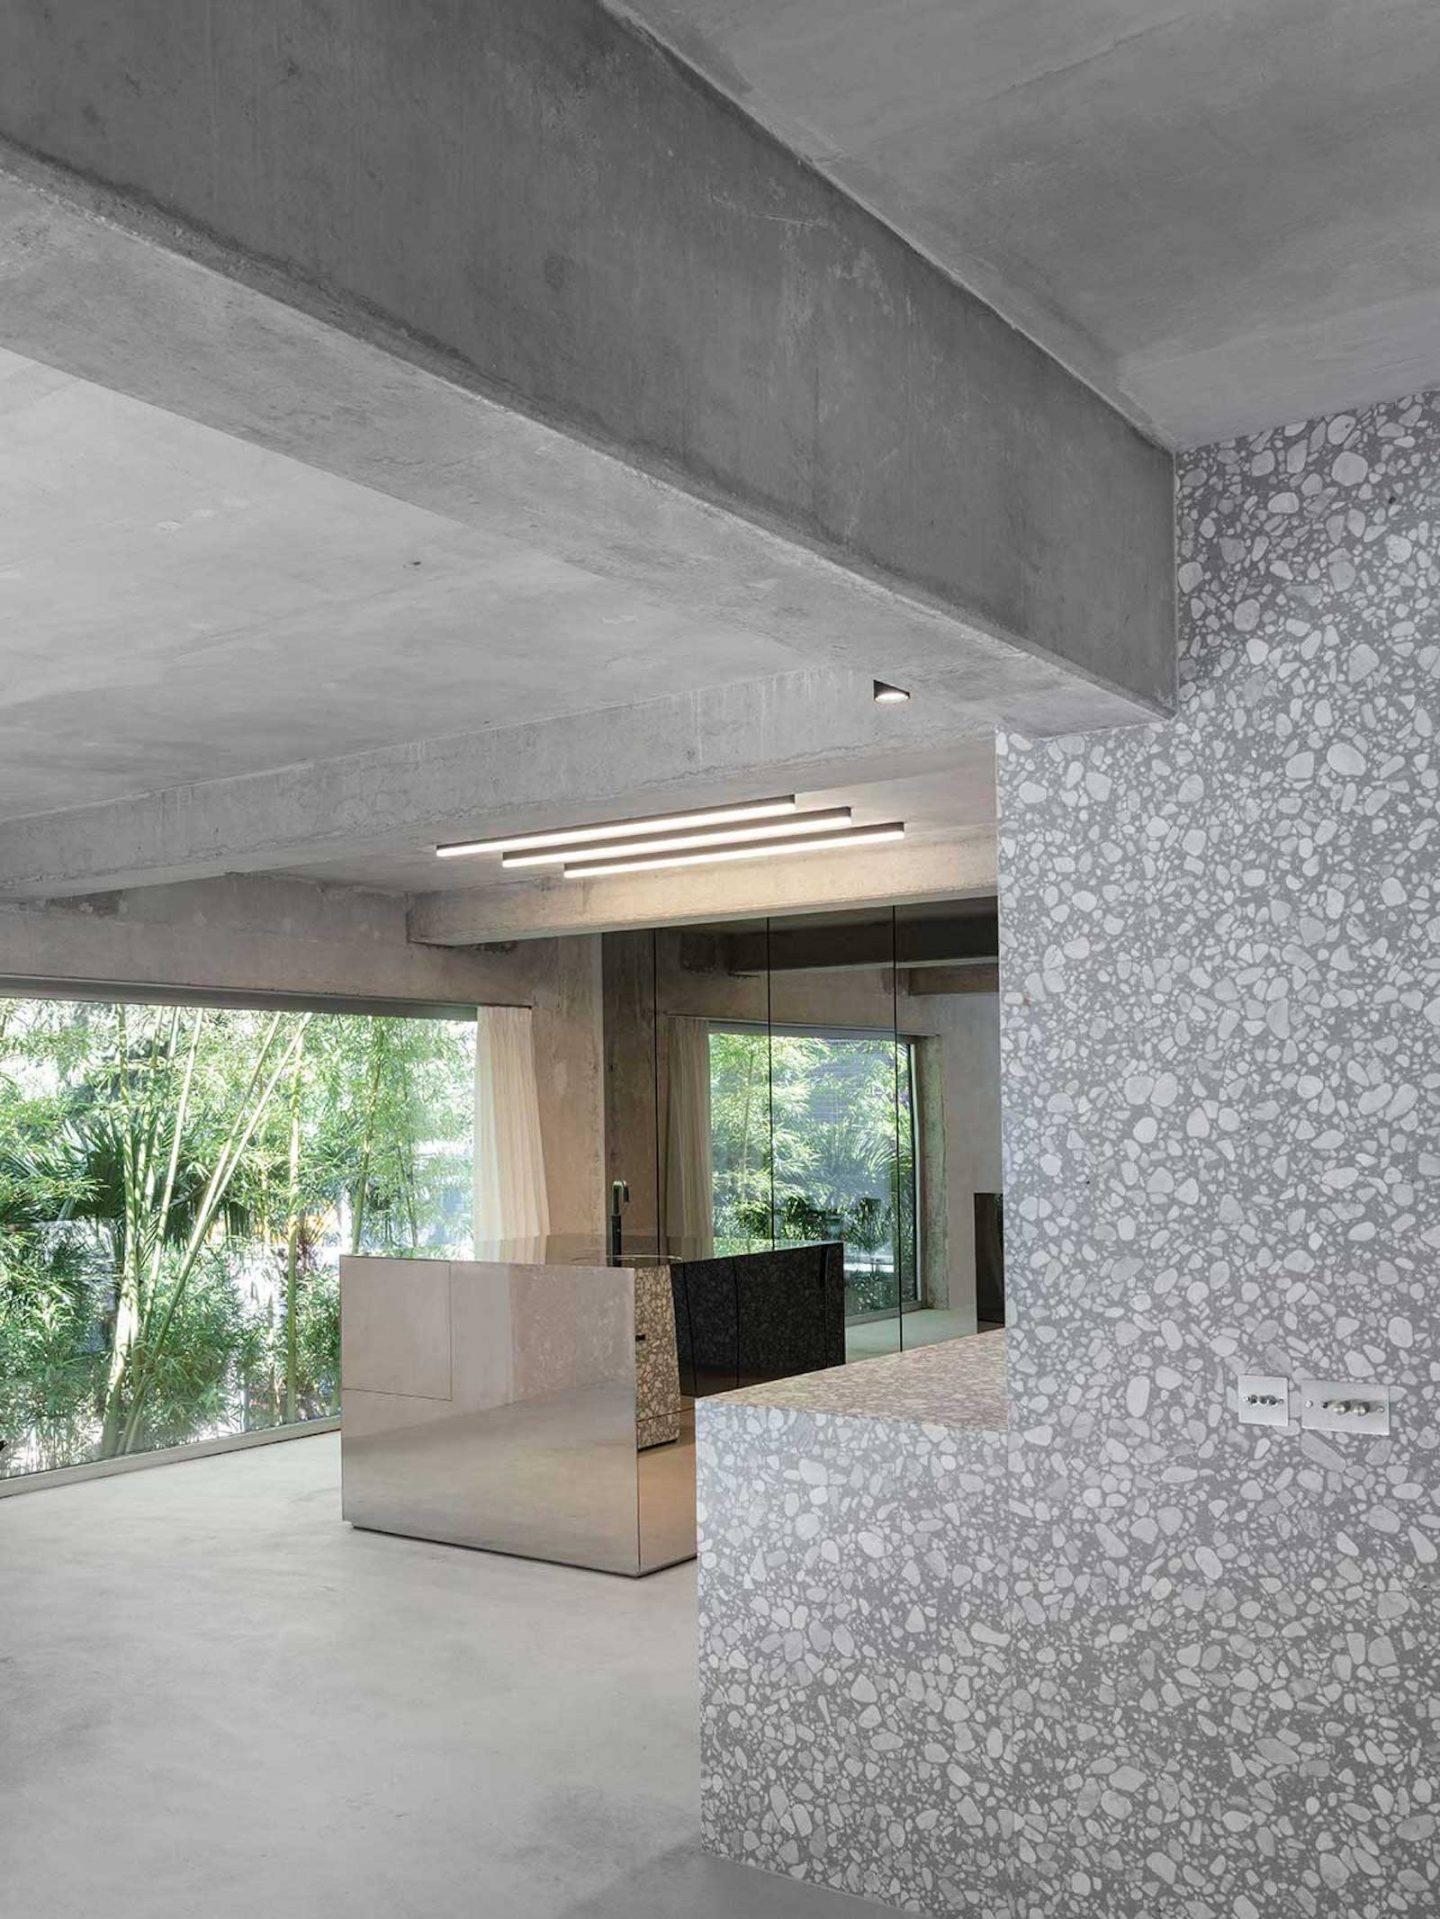 IGNANT-Architecture-JMayerH-Casa-Morgana-014